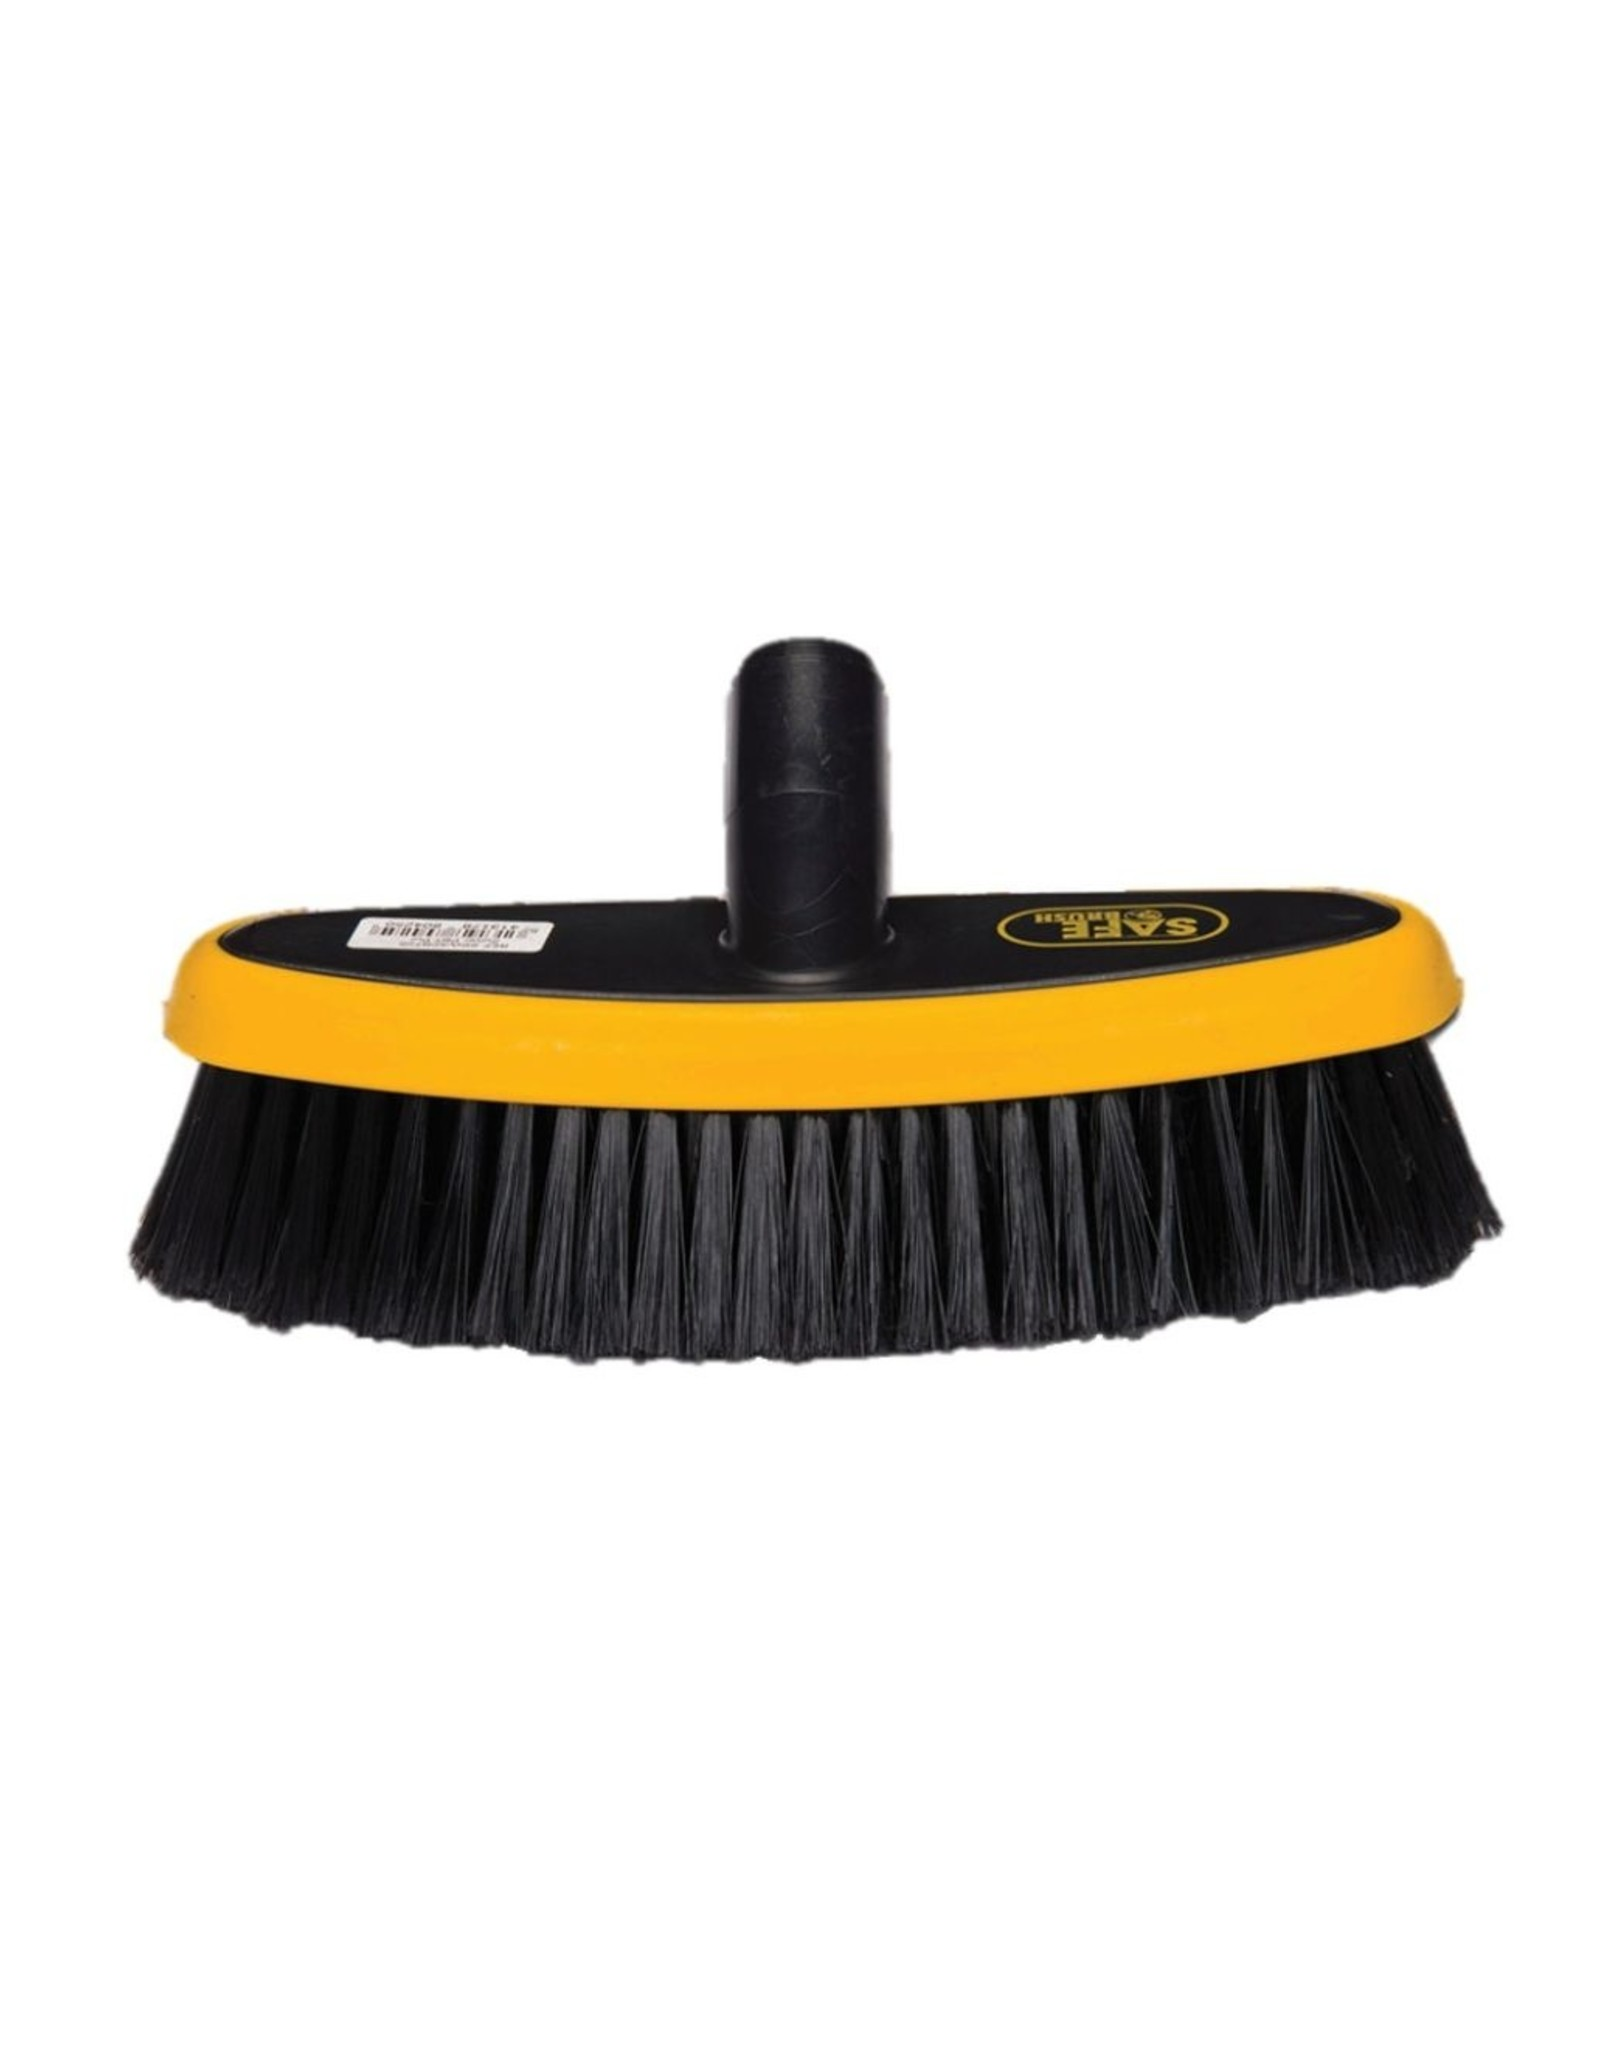 Safebrush Safebrush H2O autowasborstel met waterdoorvoer, zacht PBT